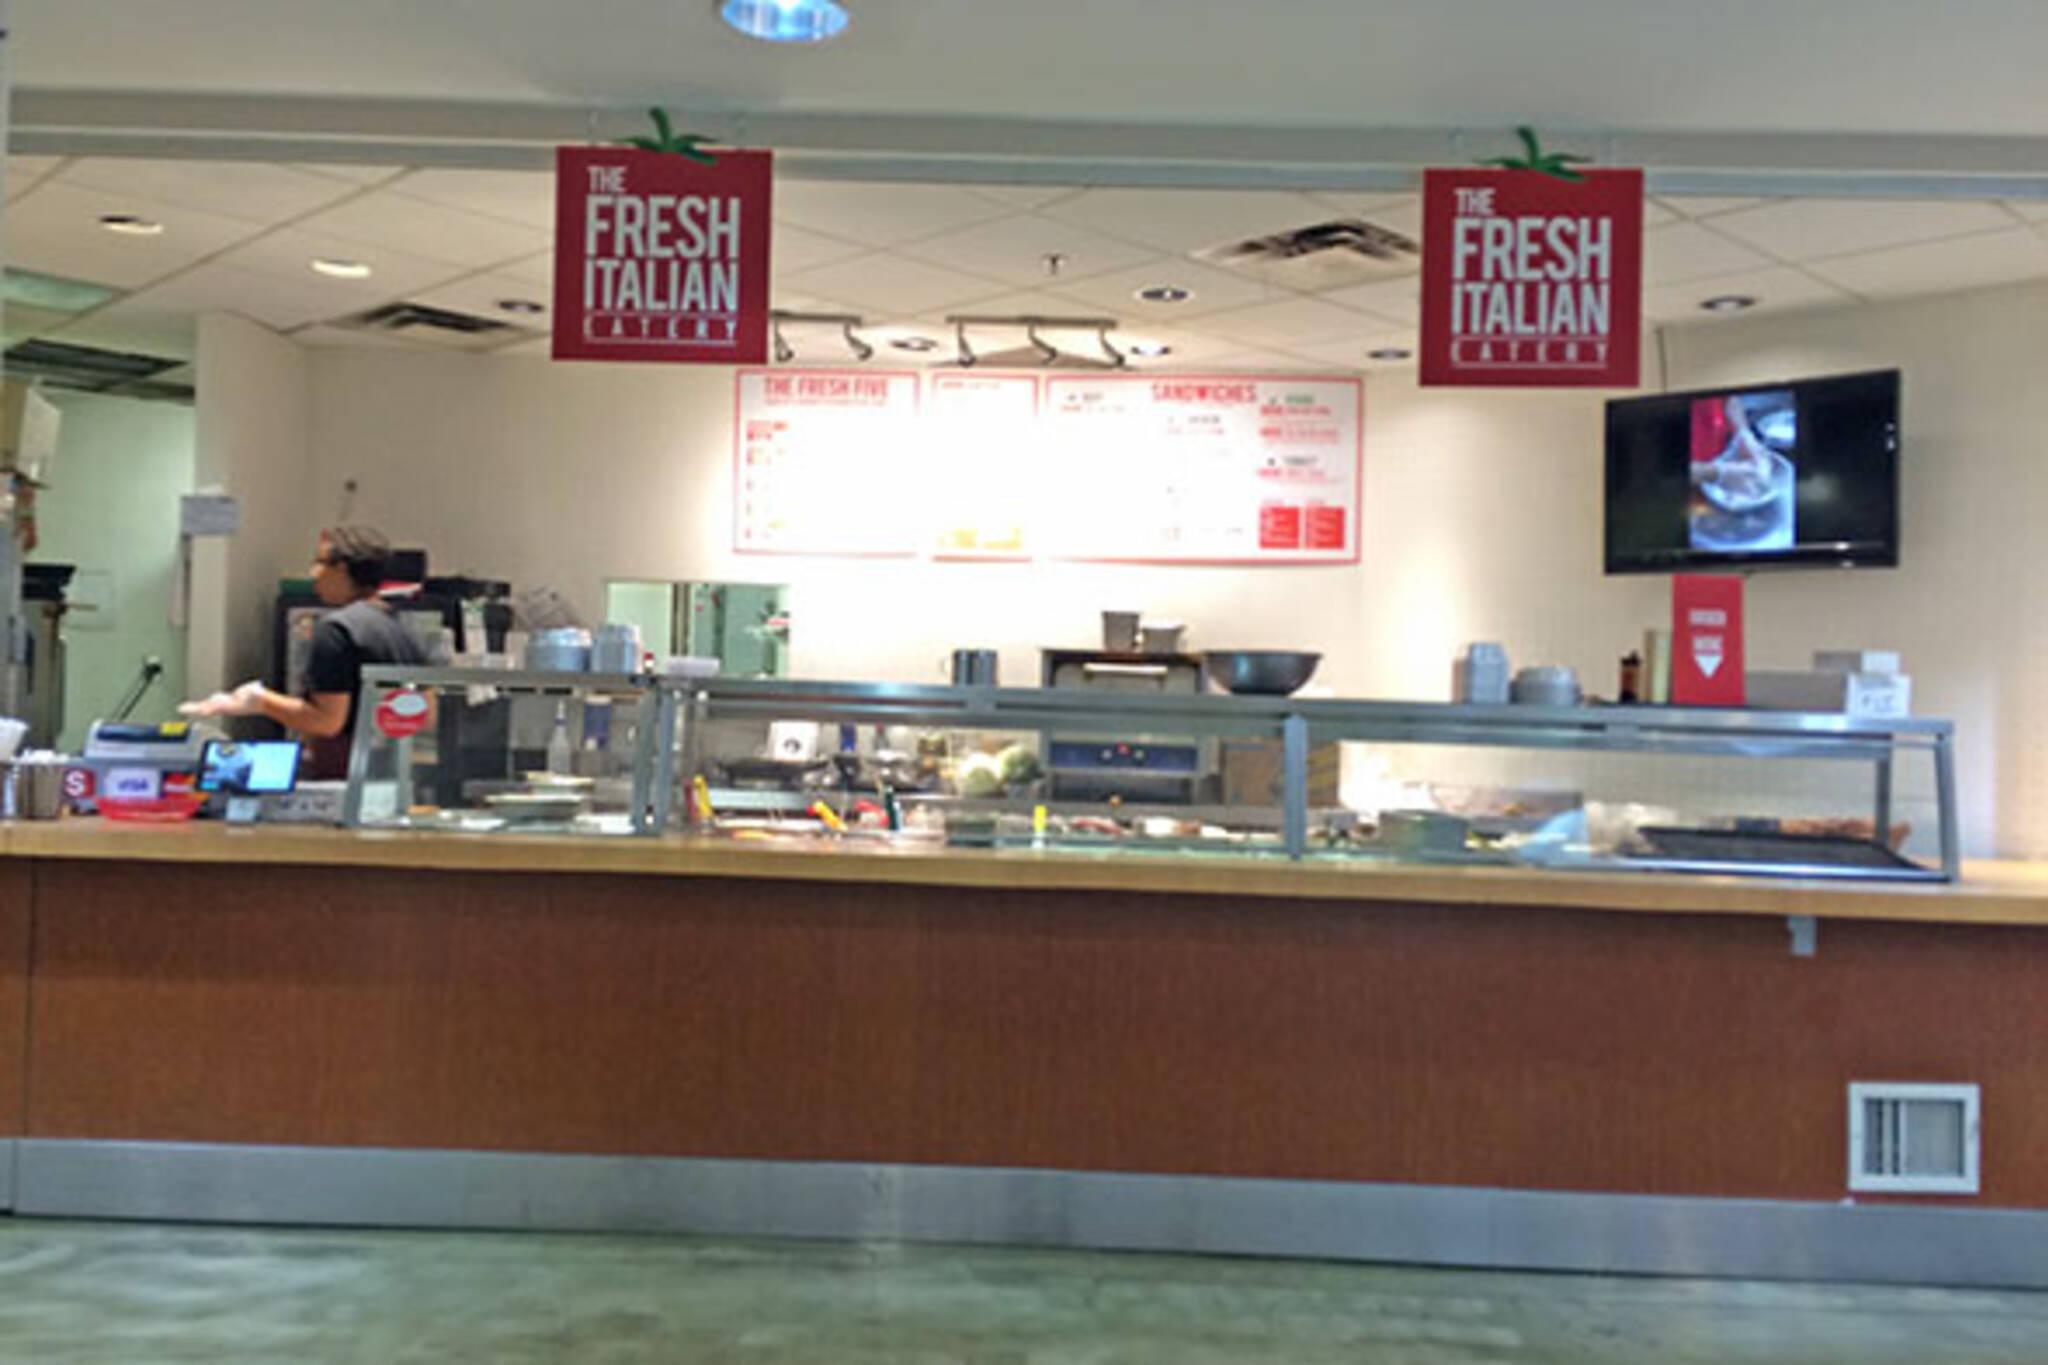 The Fresh Italian Eatery